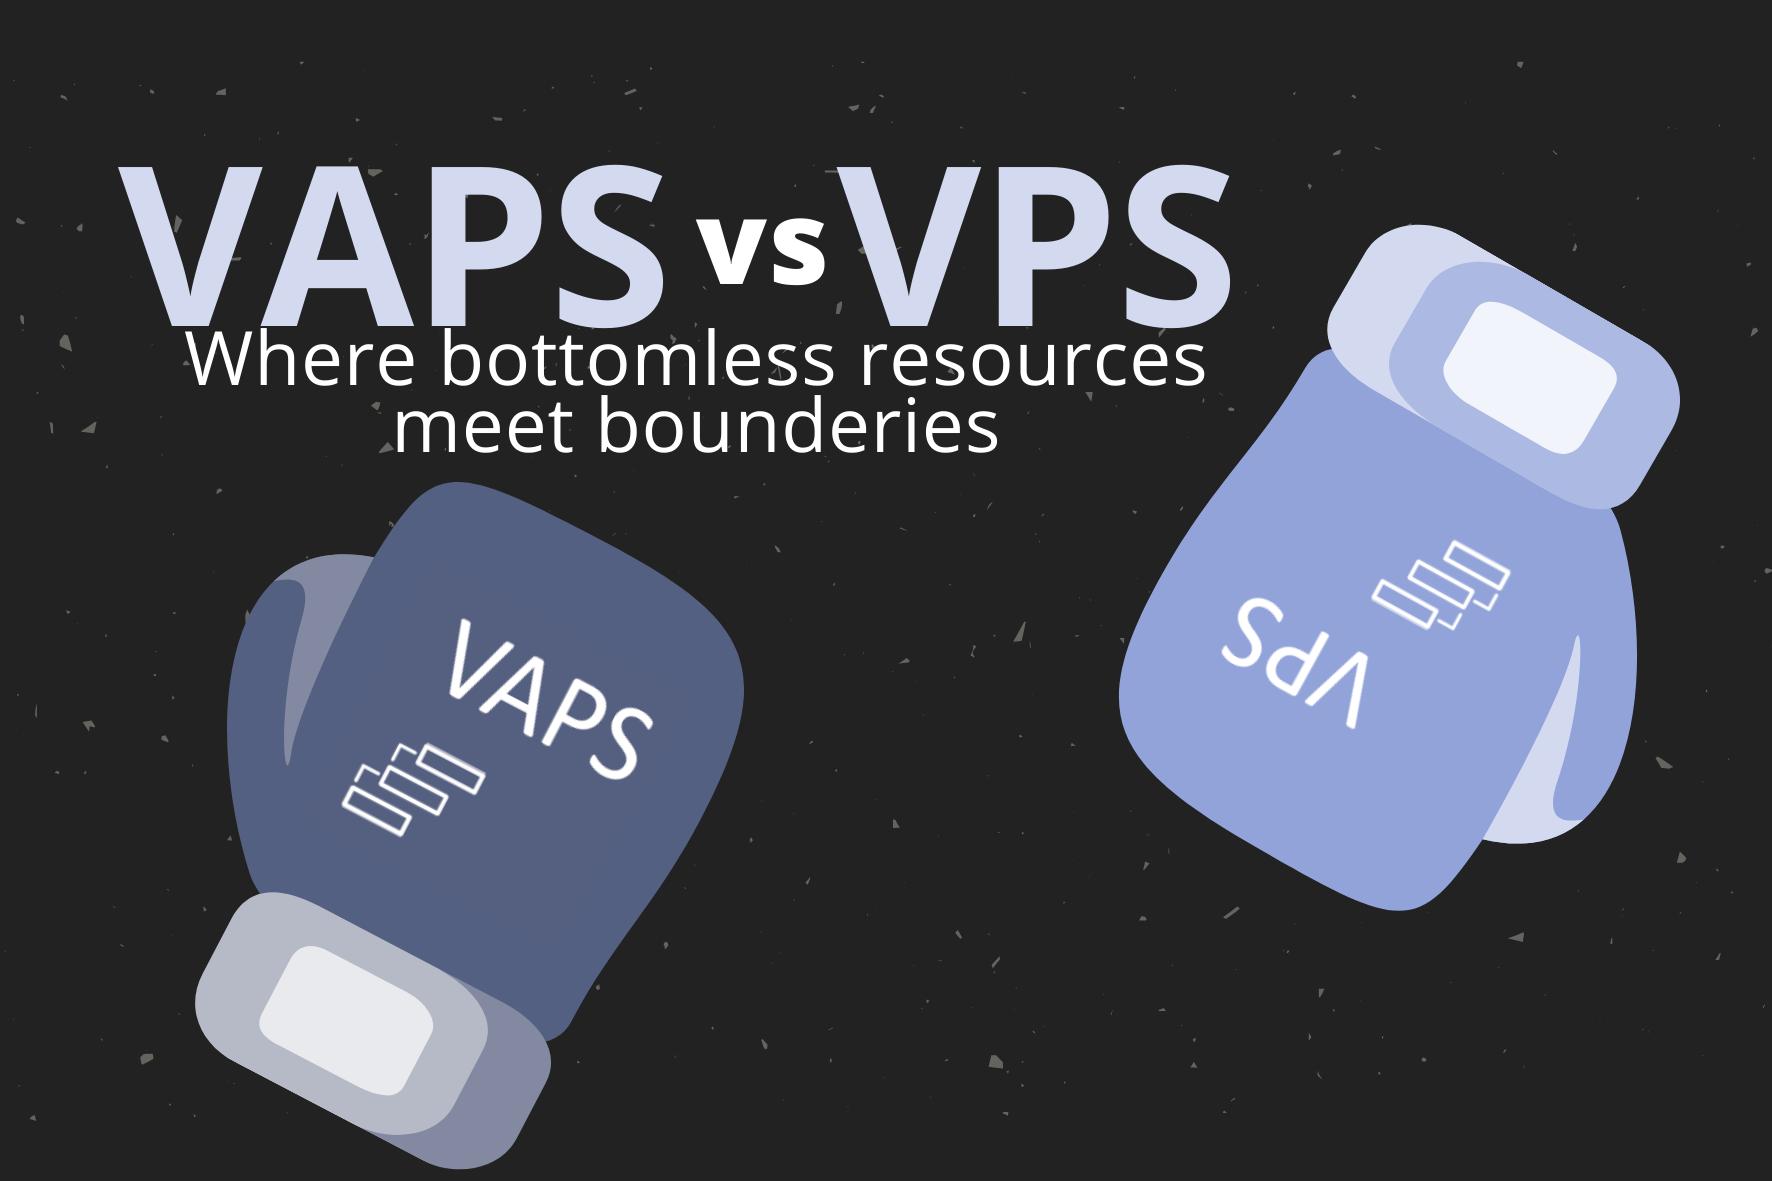 VPS vs VAPS – Where bottomless resources meet boundaries